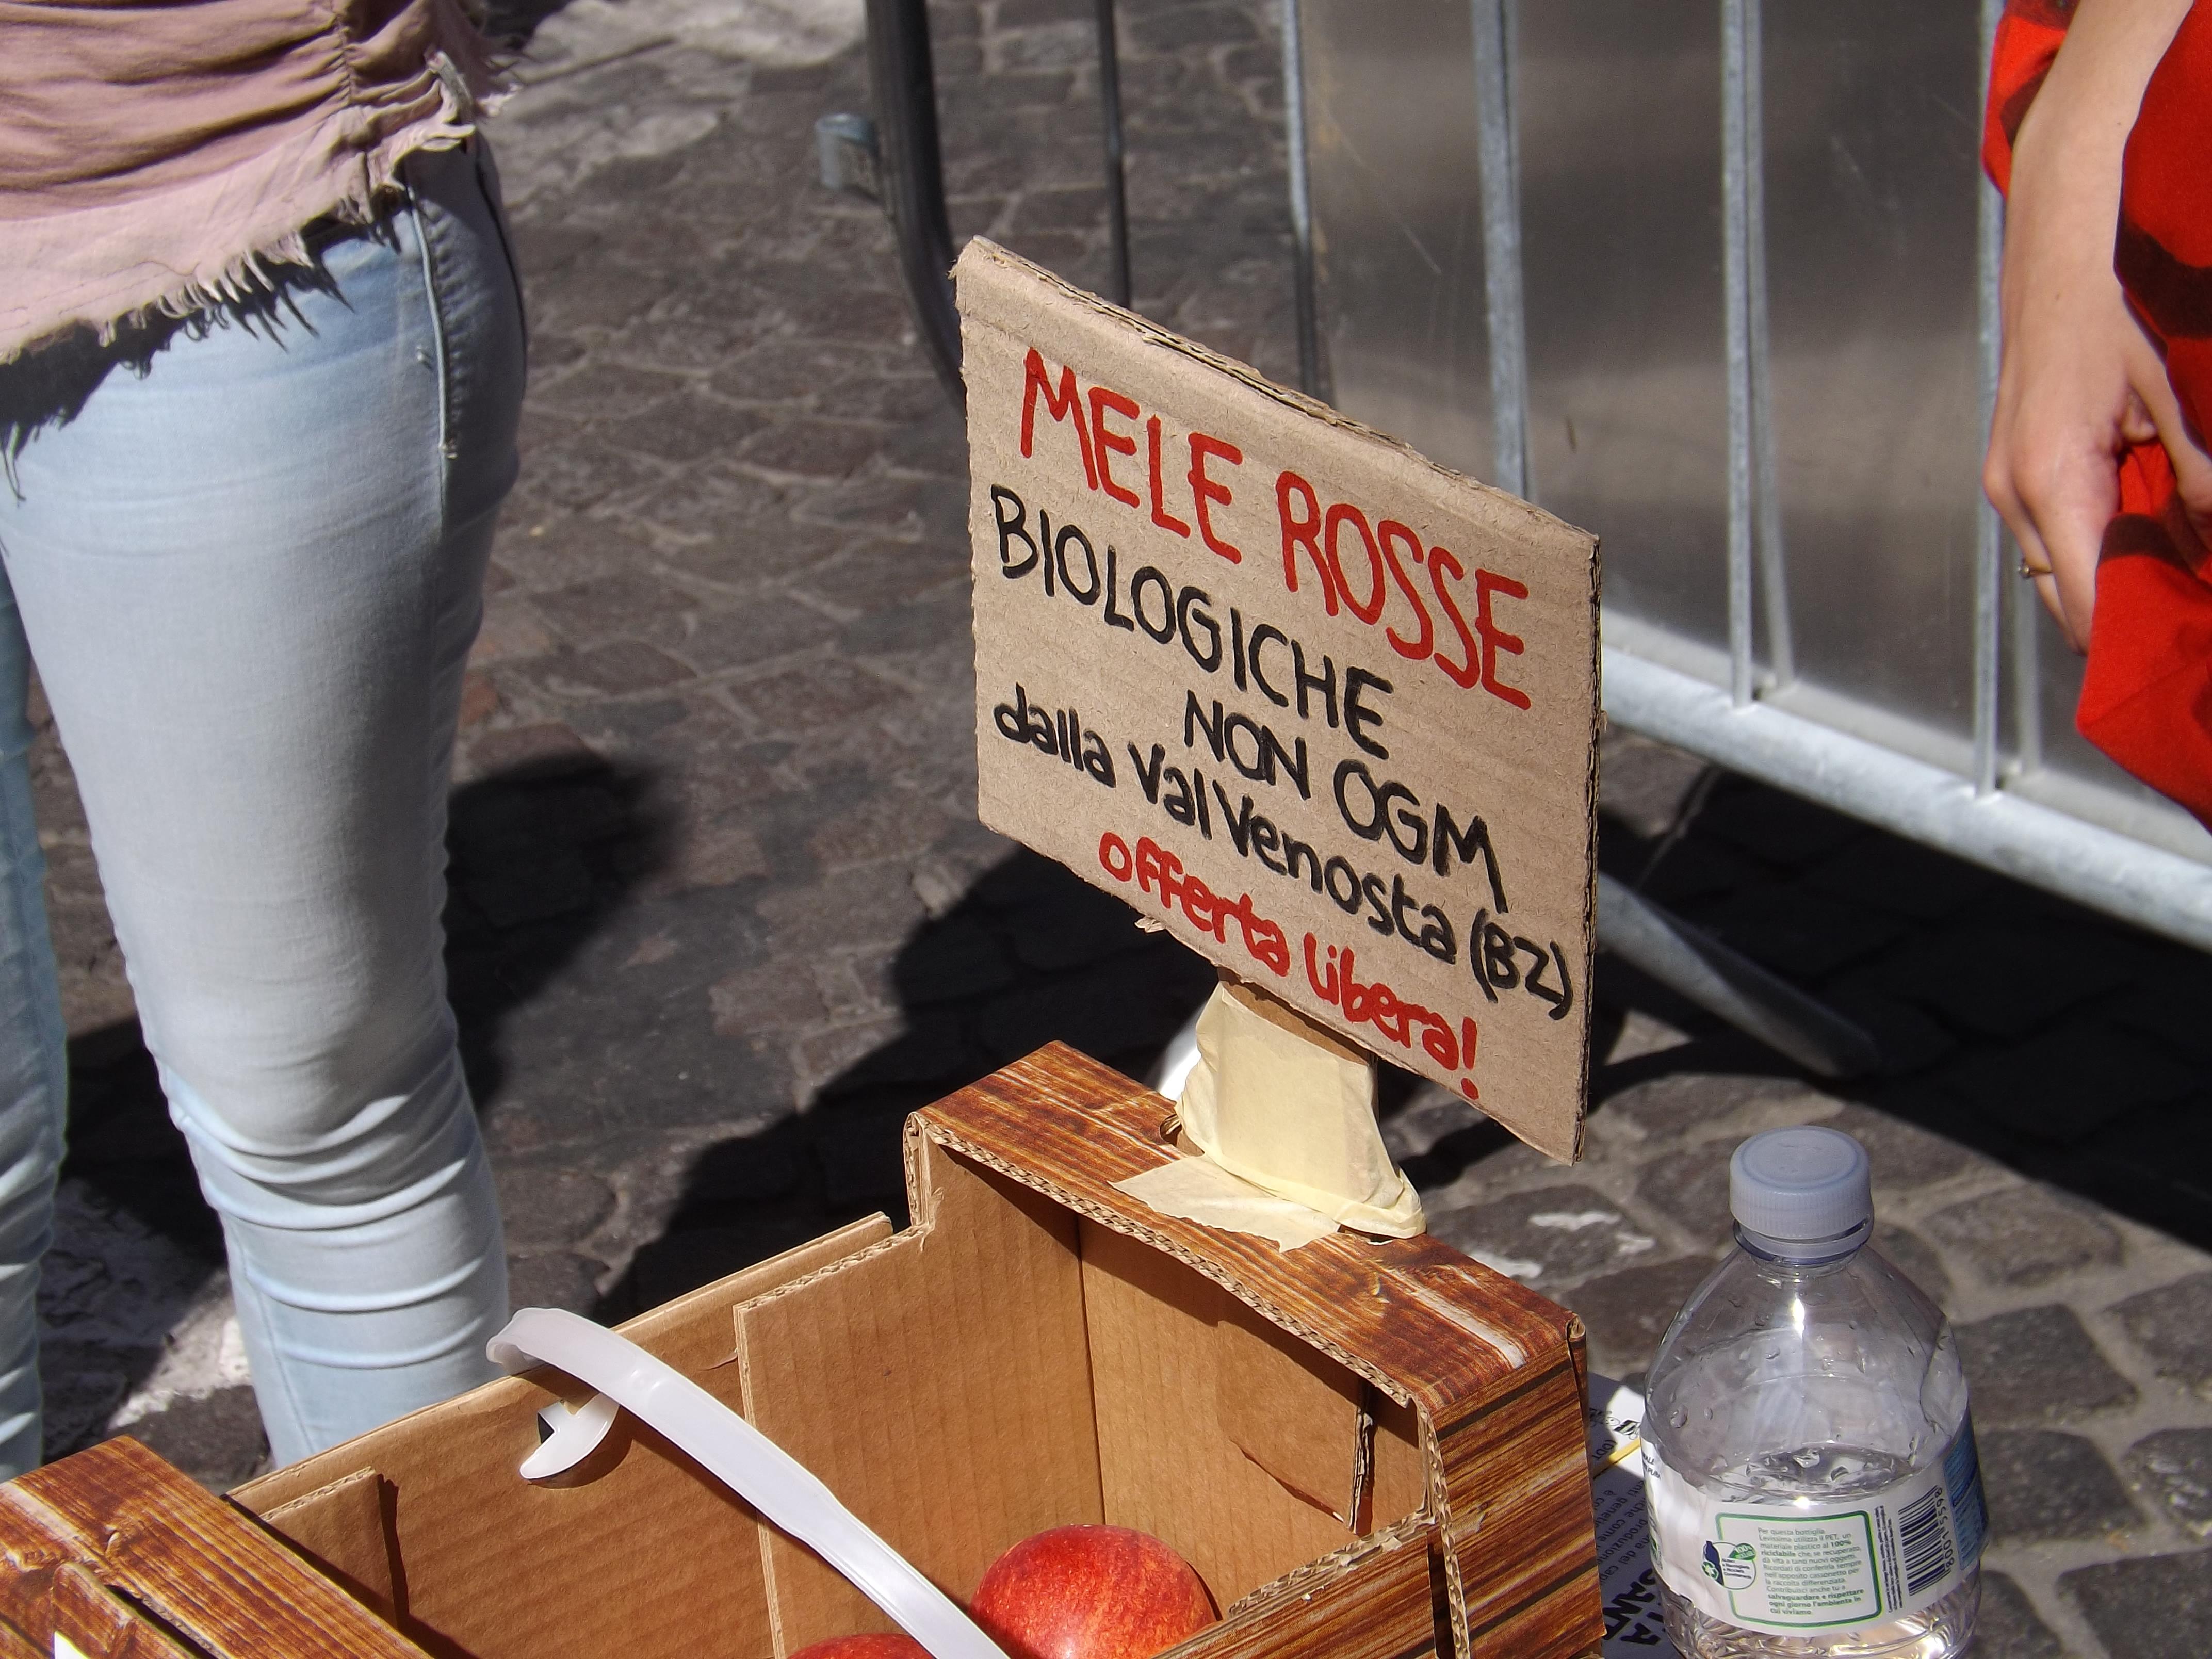 Bologna, al presidio offerte mele biologiche AntiMonsanto.